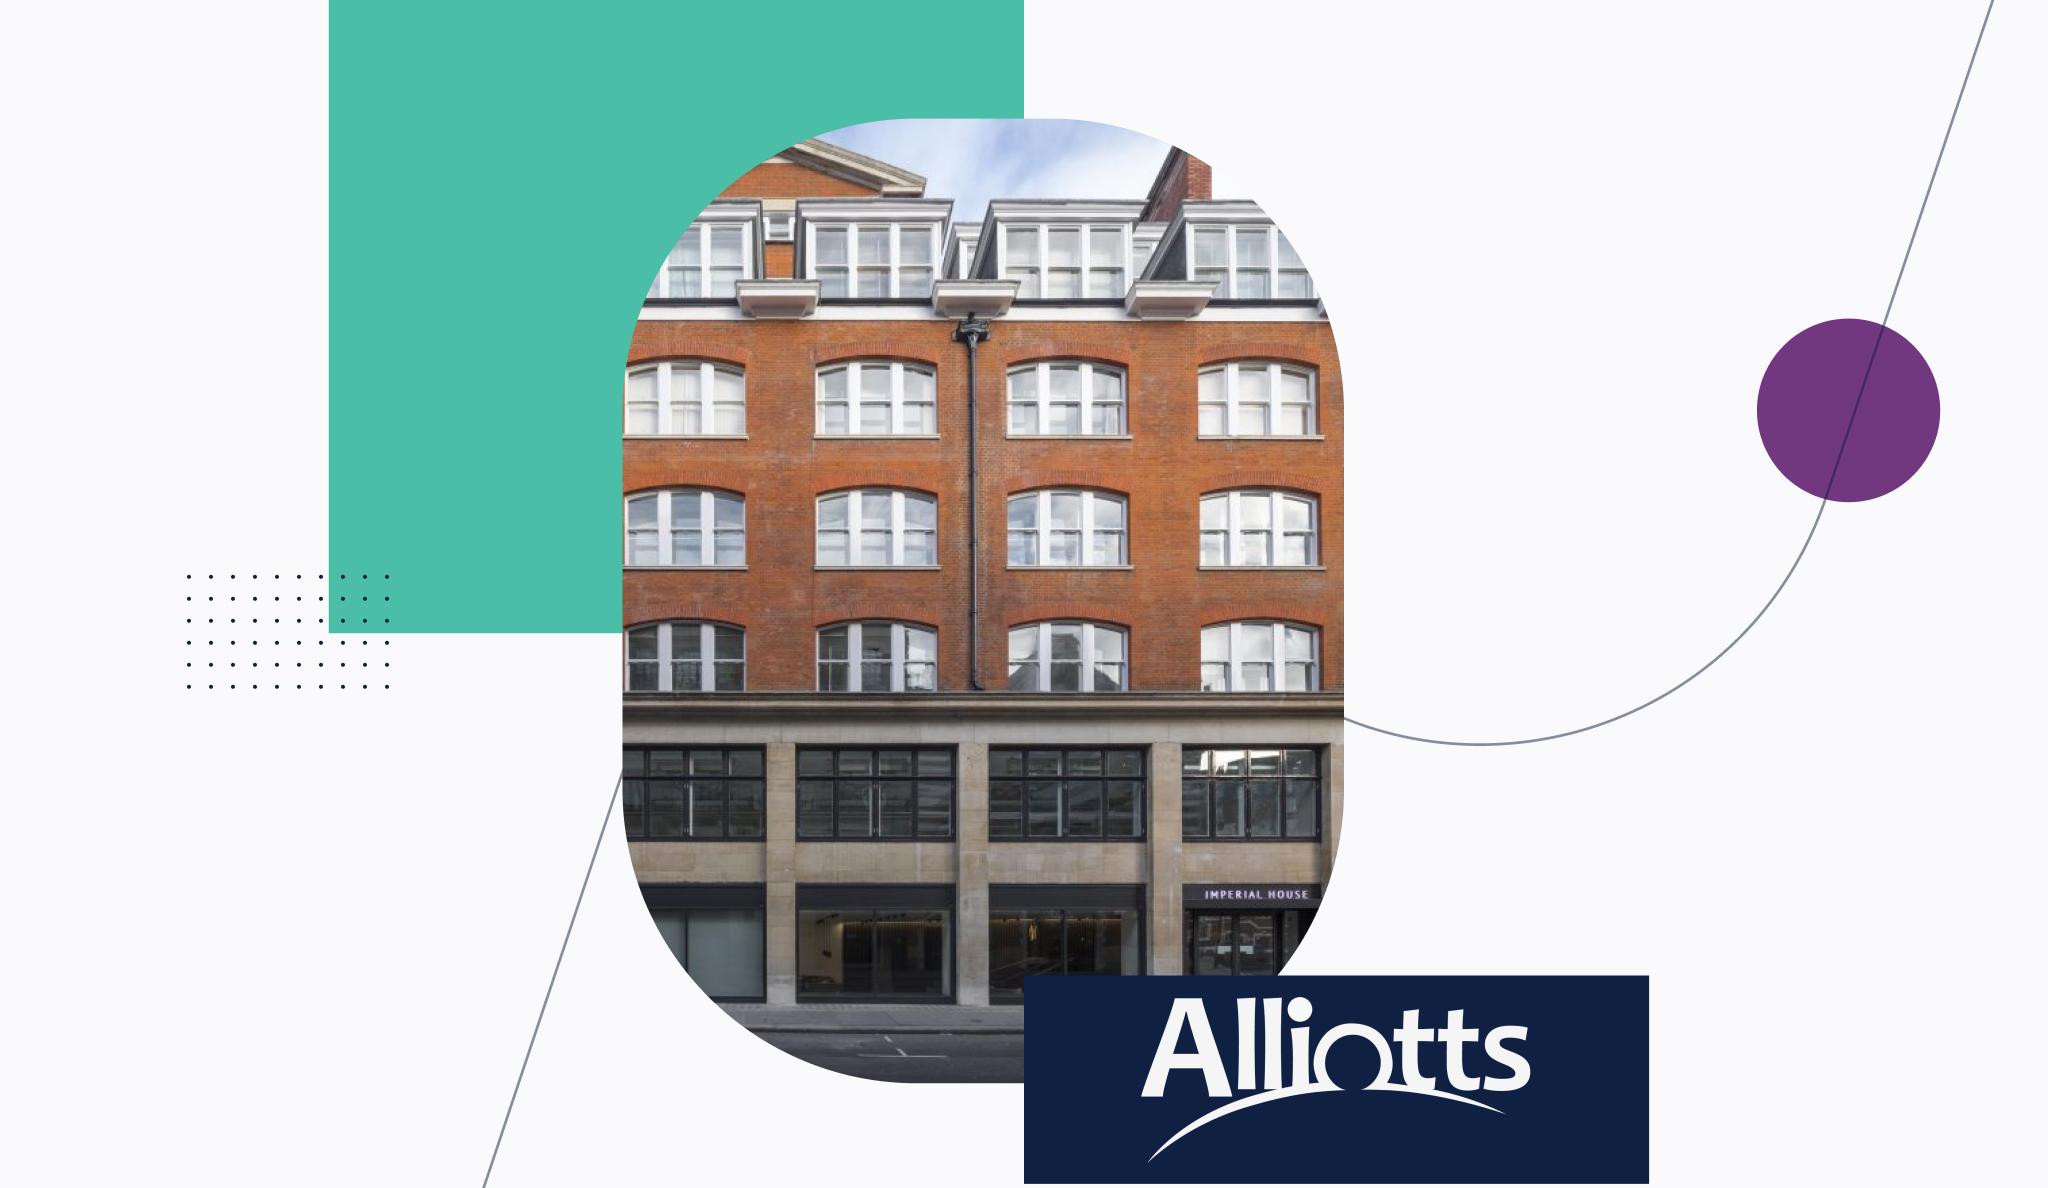 Alliotts customer story